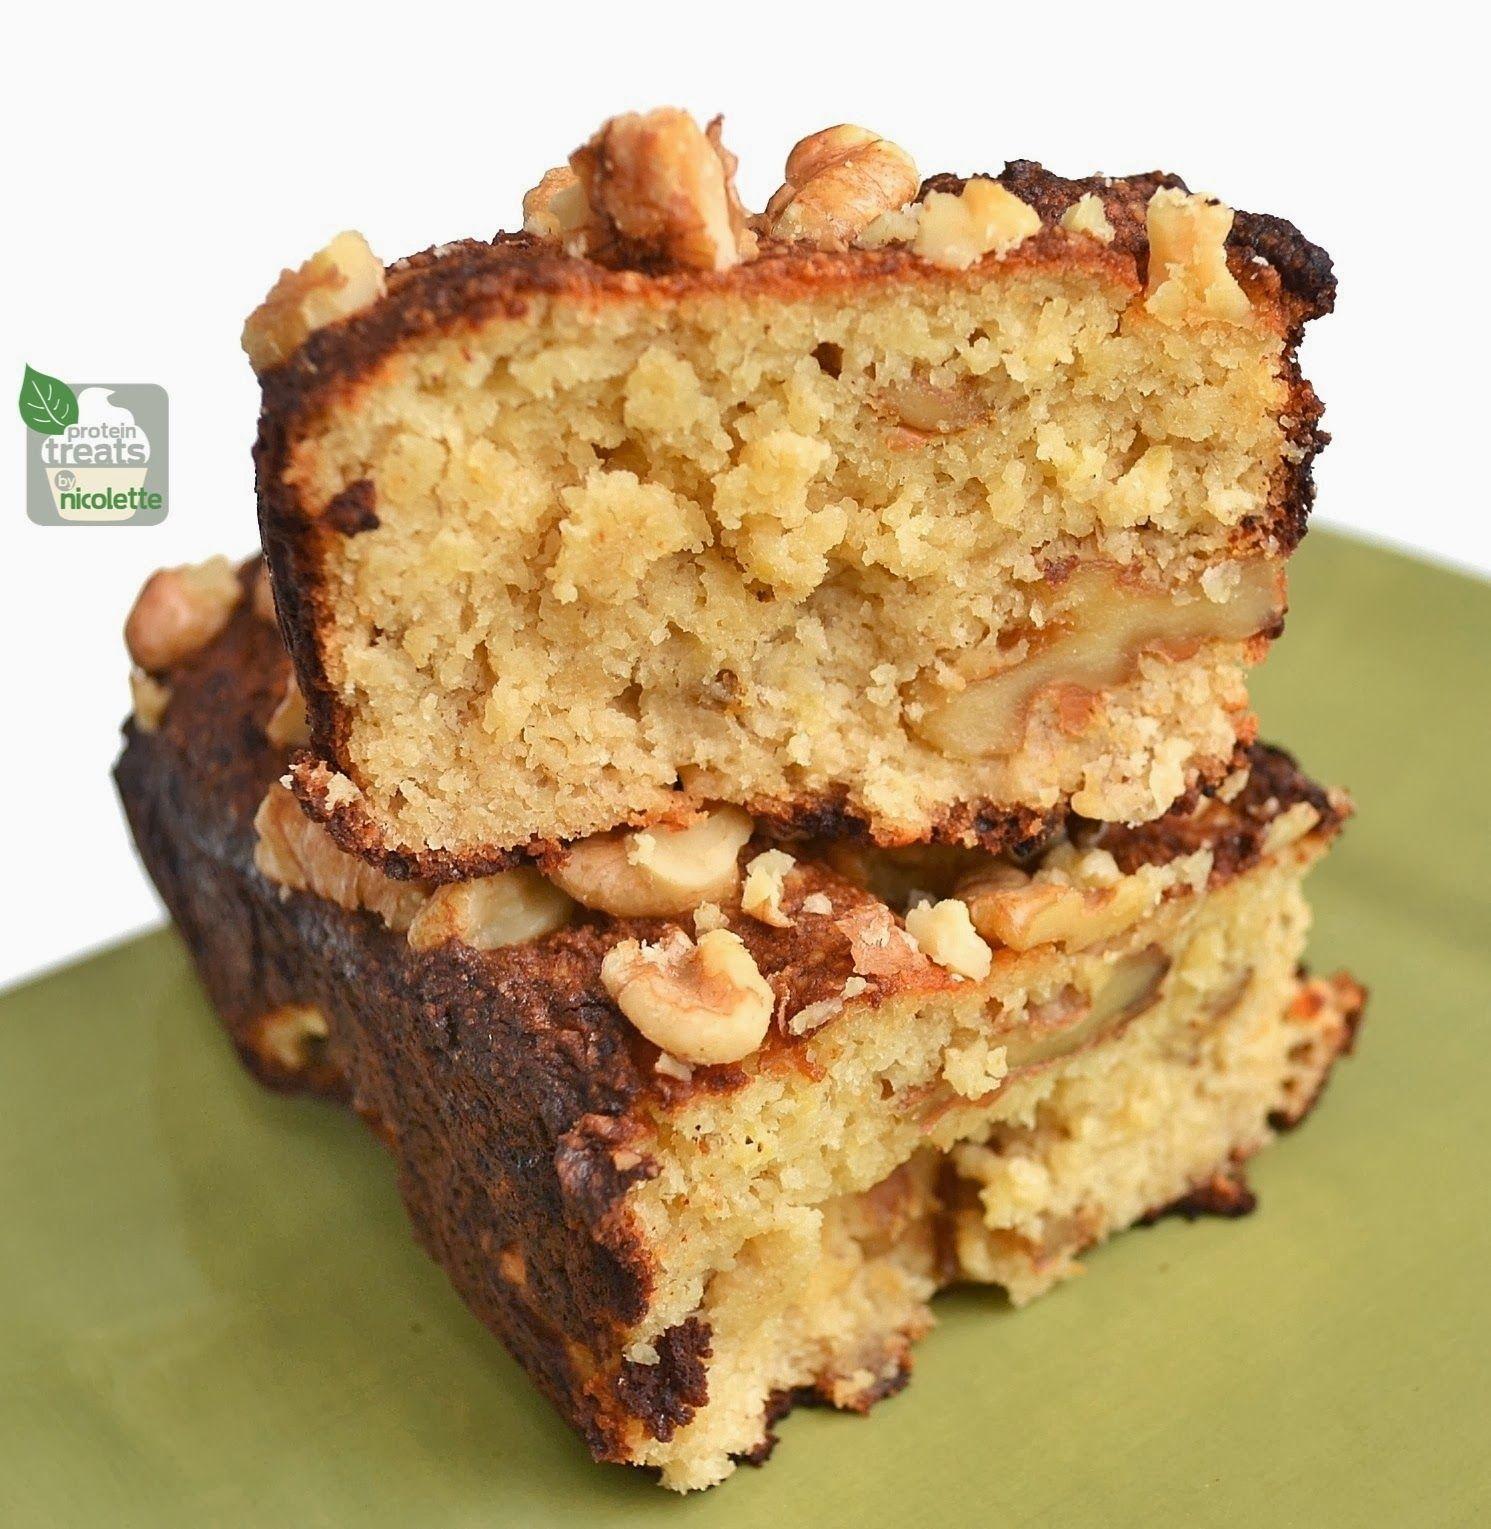 Gluten-Free Paleo Friendly Protein Banana Bread #glutenfree #bananabread #paleo #protein